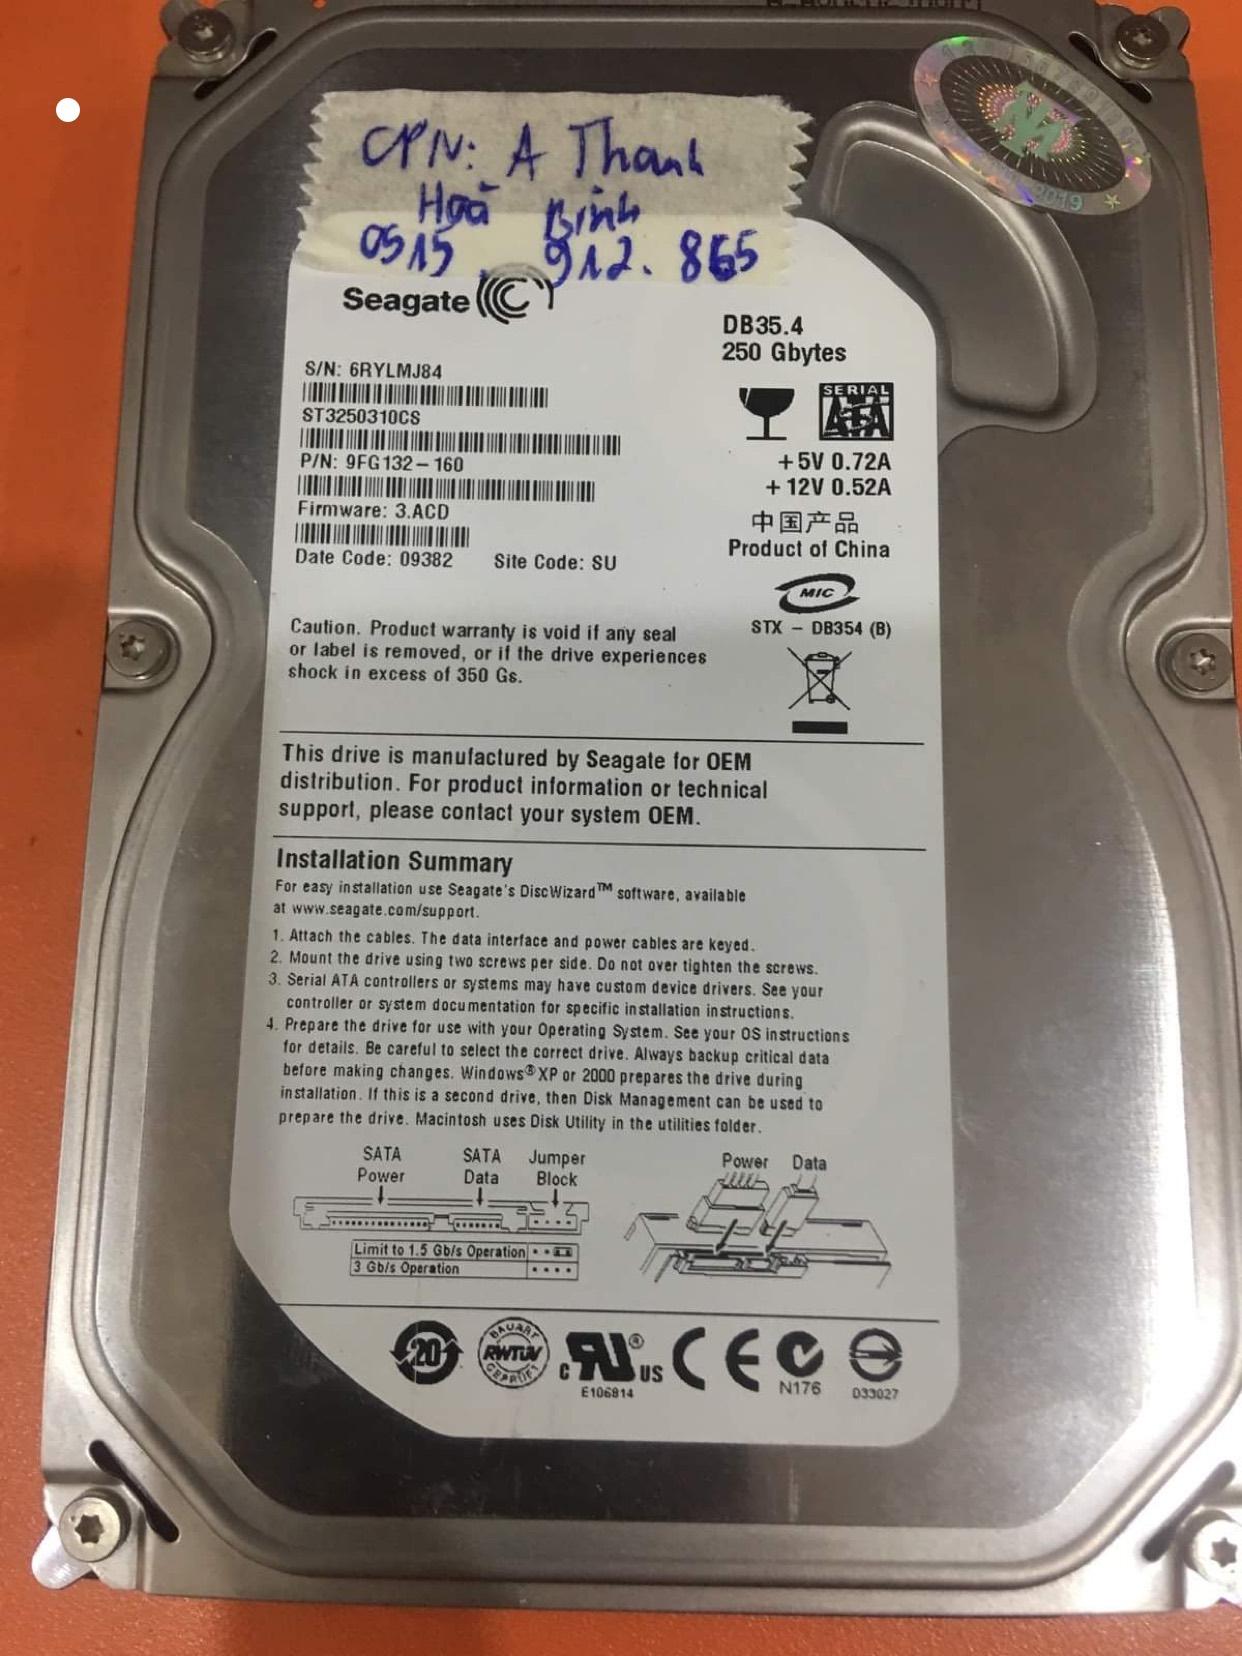 Cứu dữ liệu ổ cứng Seagate 250GB lỗi cơ tại Hòa Bình 26/06/2020 - cuumaytinh